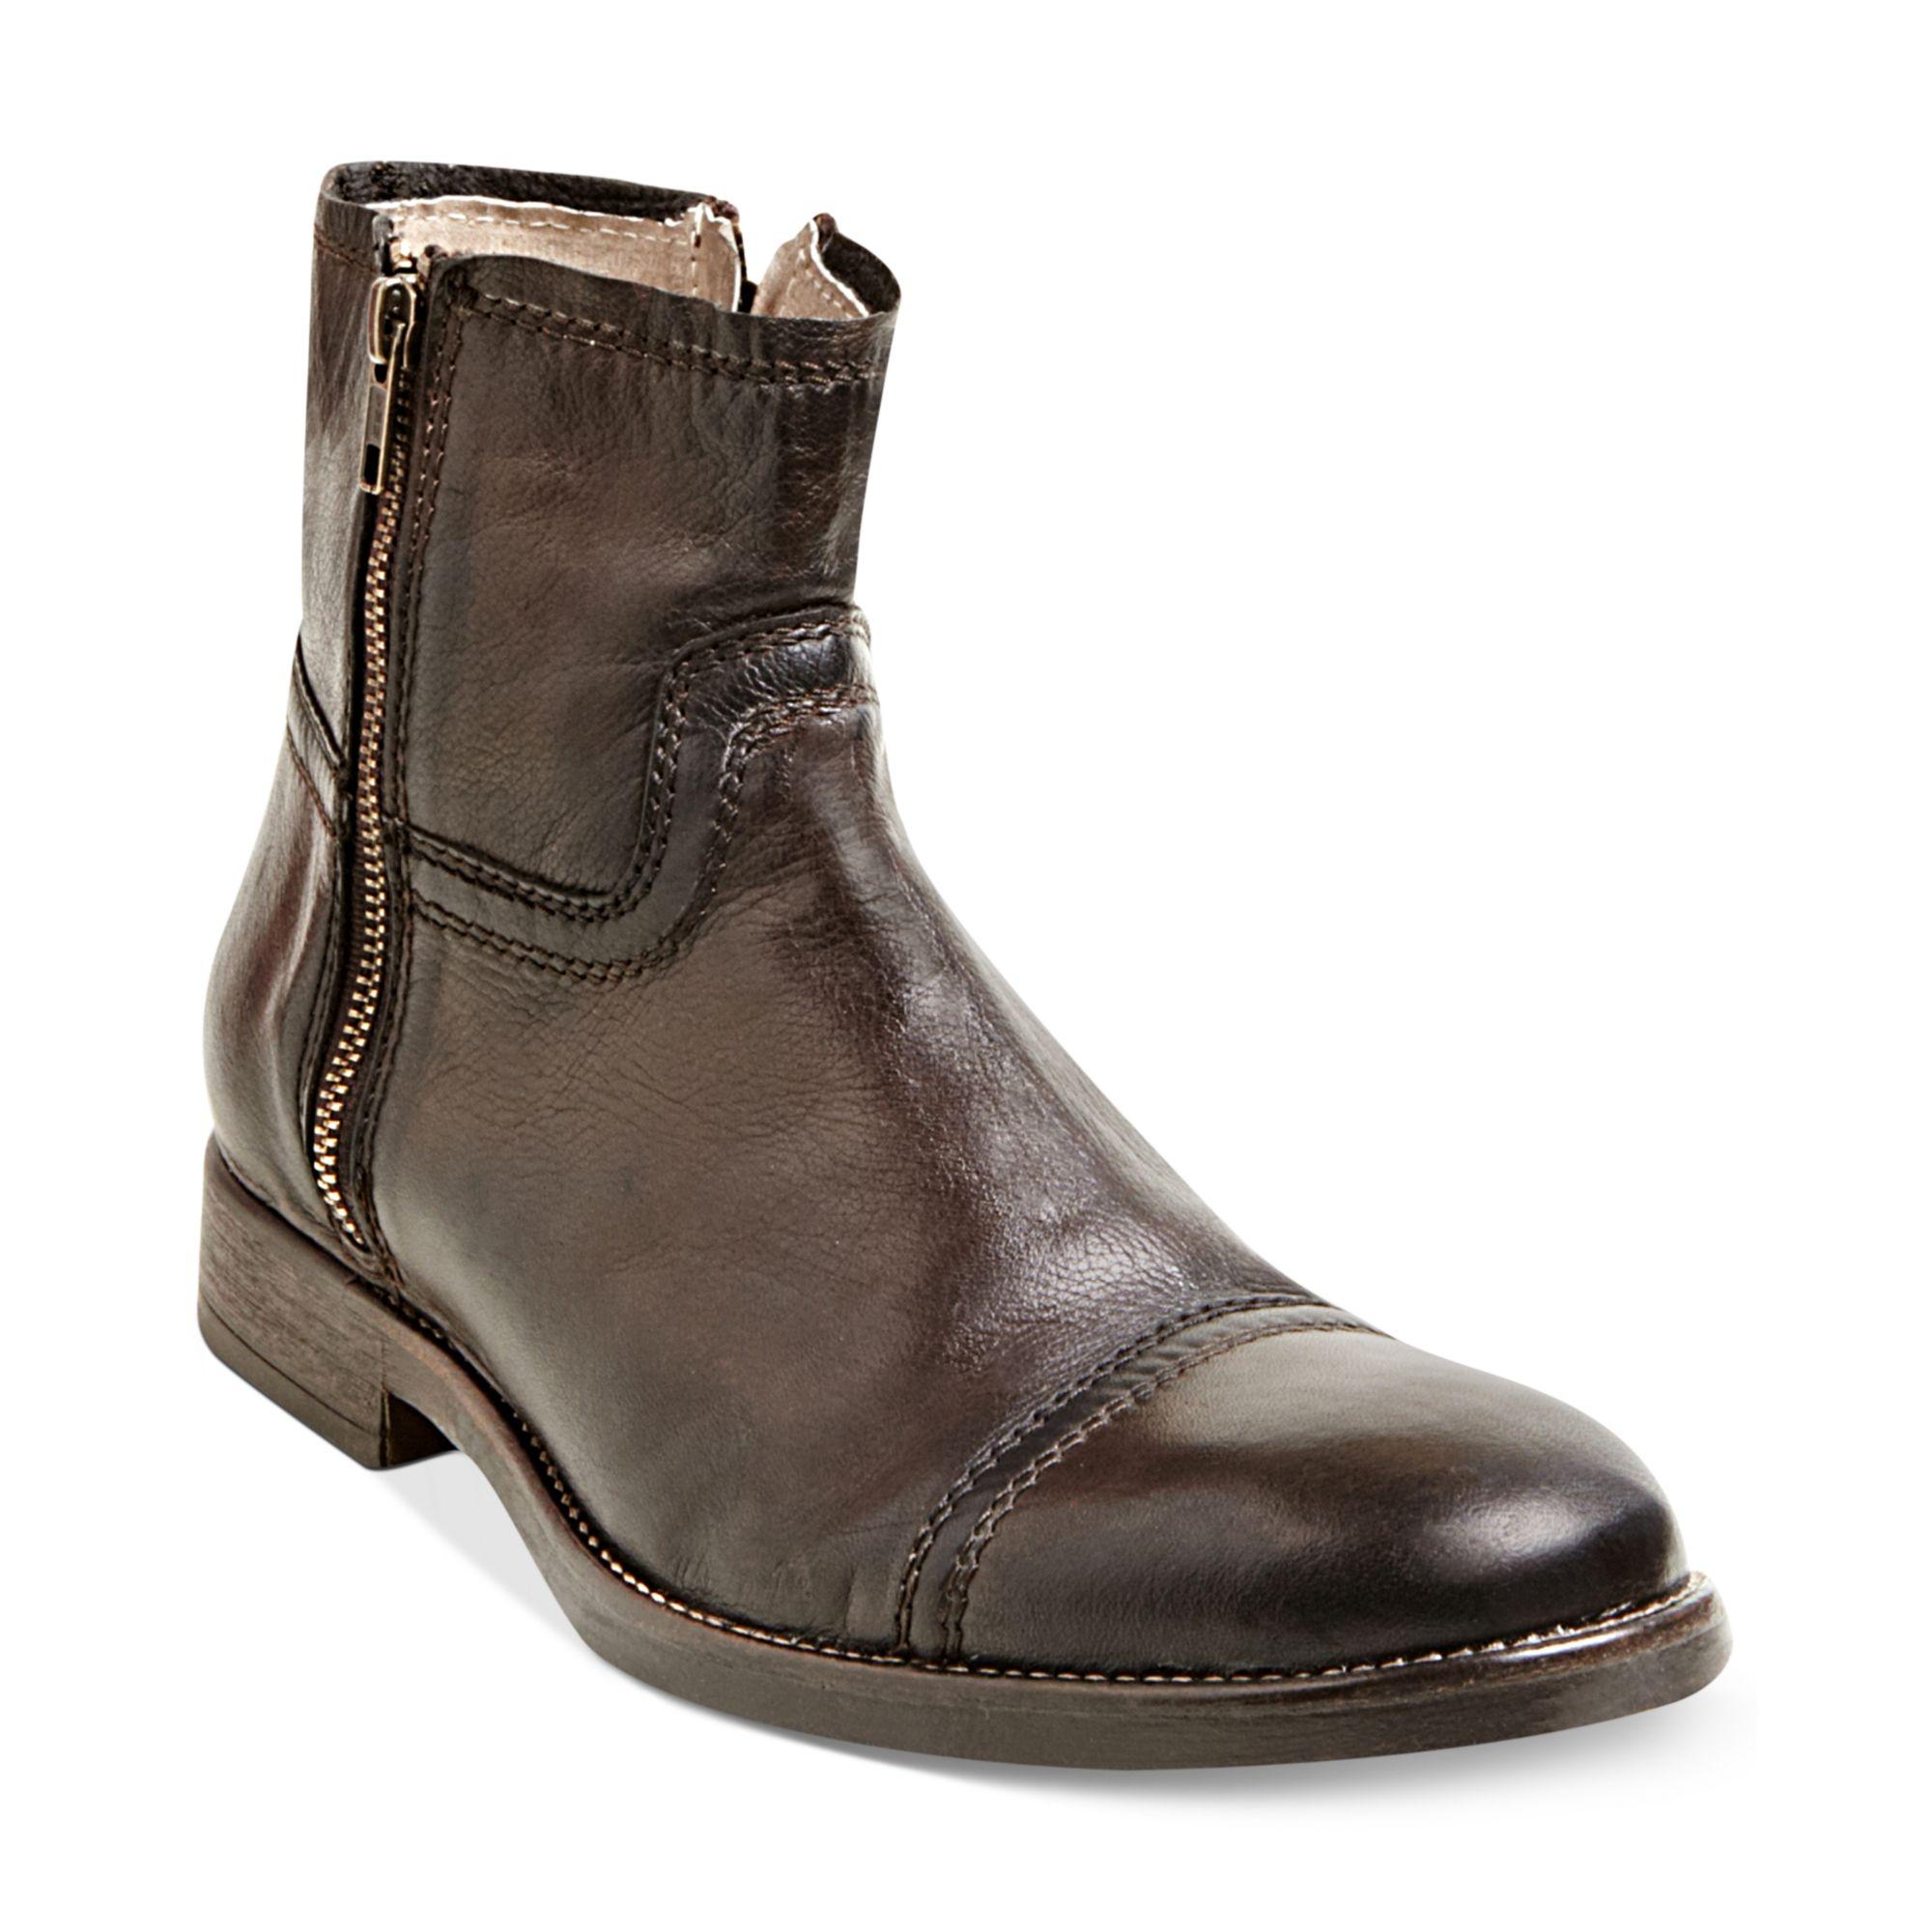 steve madden forza boots in brown for men lyst. Black Bedroom Furniture Sets. Home Design Ideas